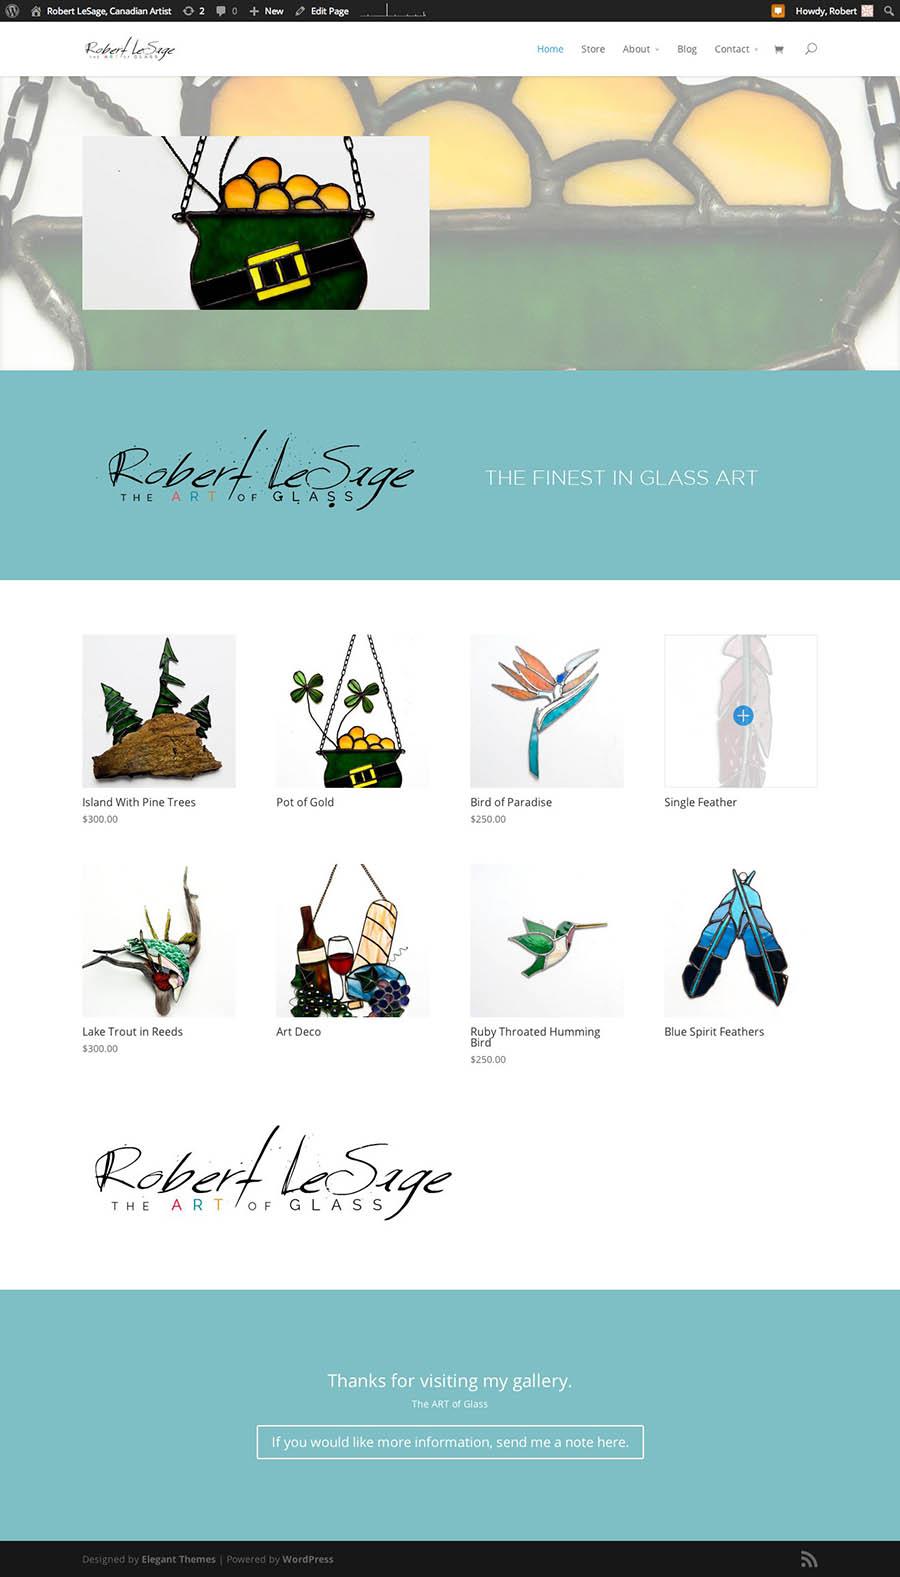 Robert LeSage